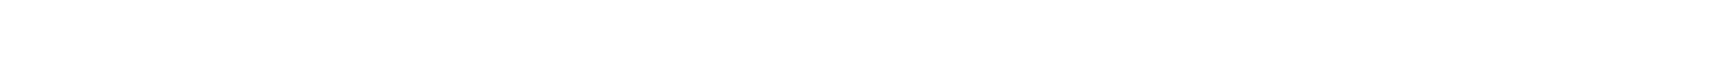 [Claireperk] Perkins and Perkins Perkins + Perkins Horizontal Reverse RGB